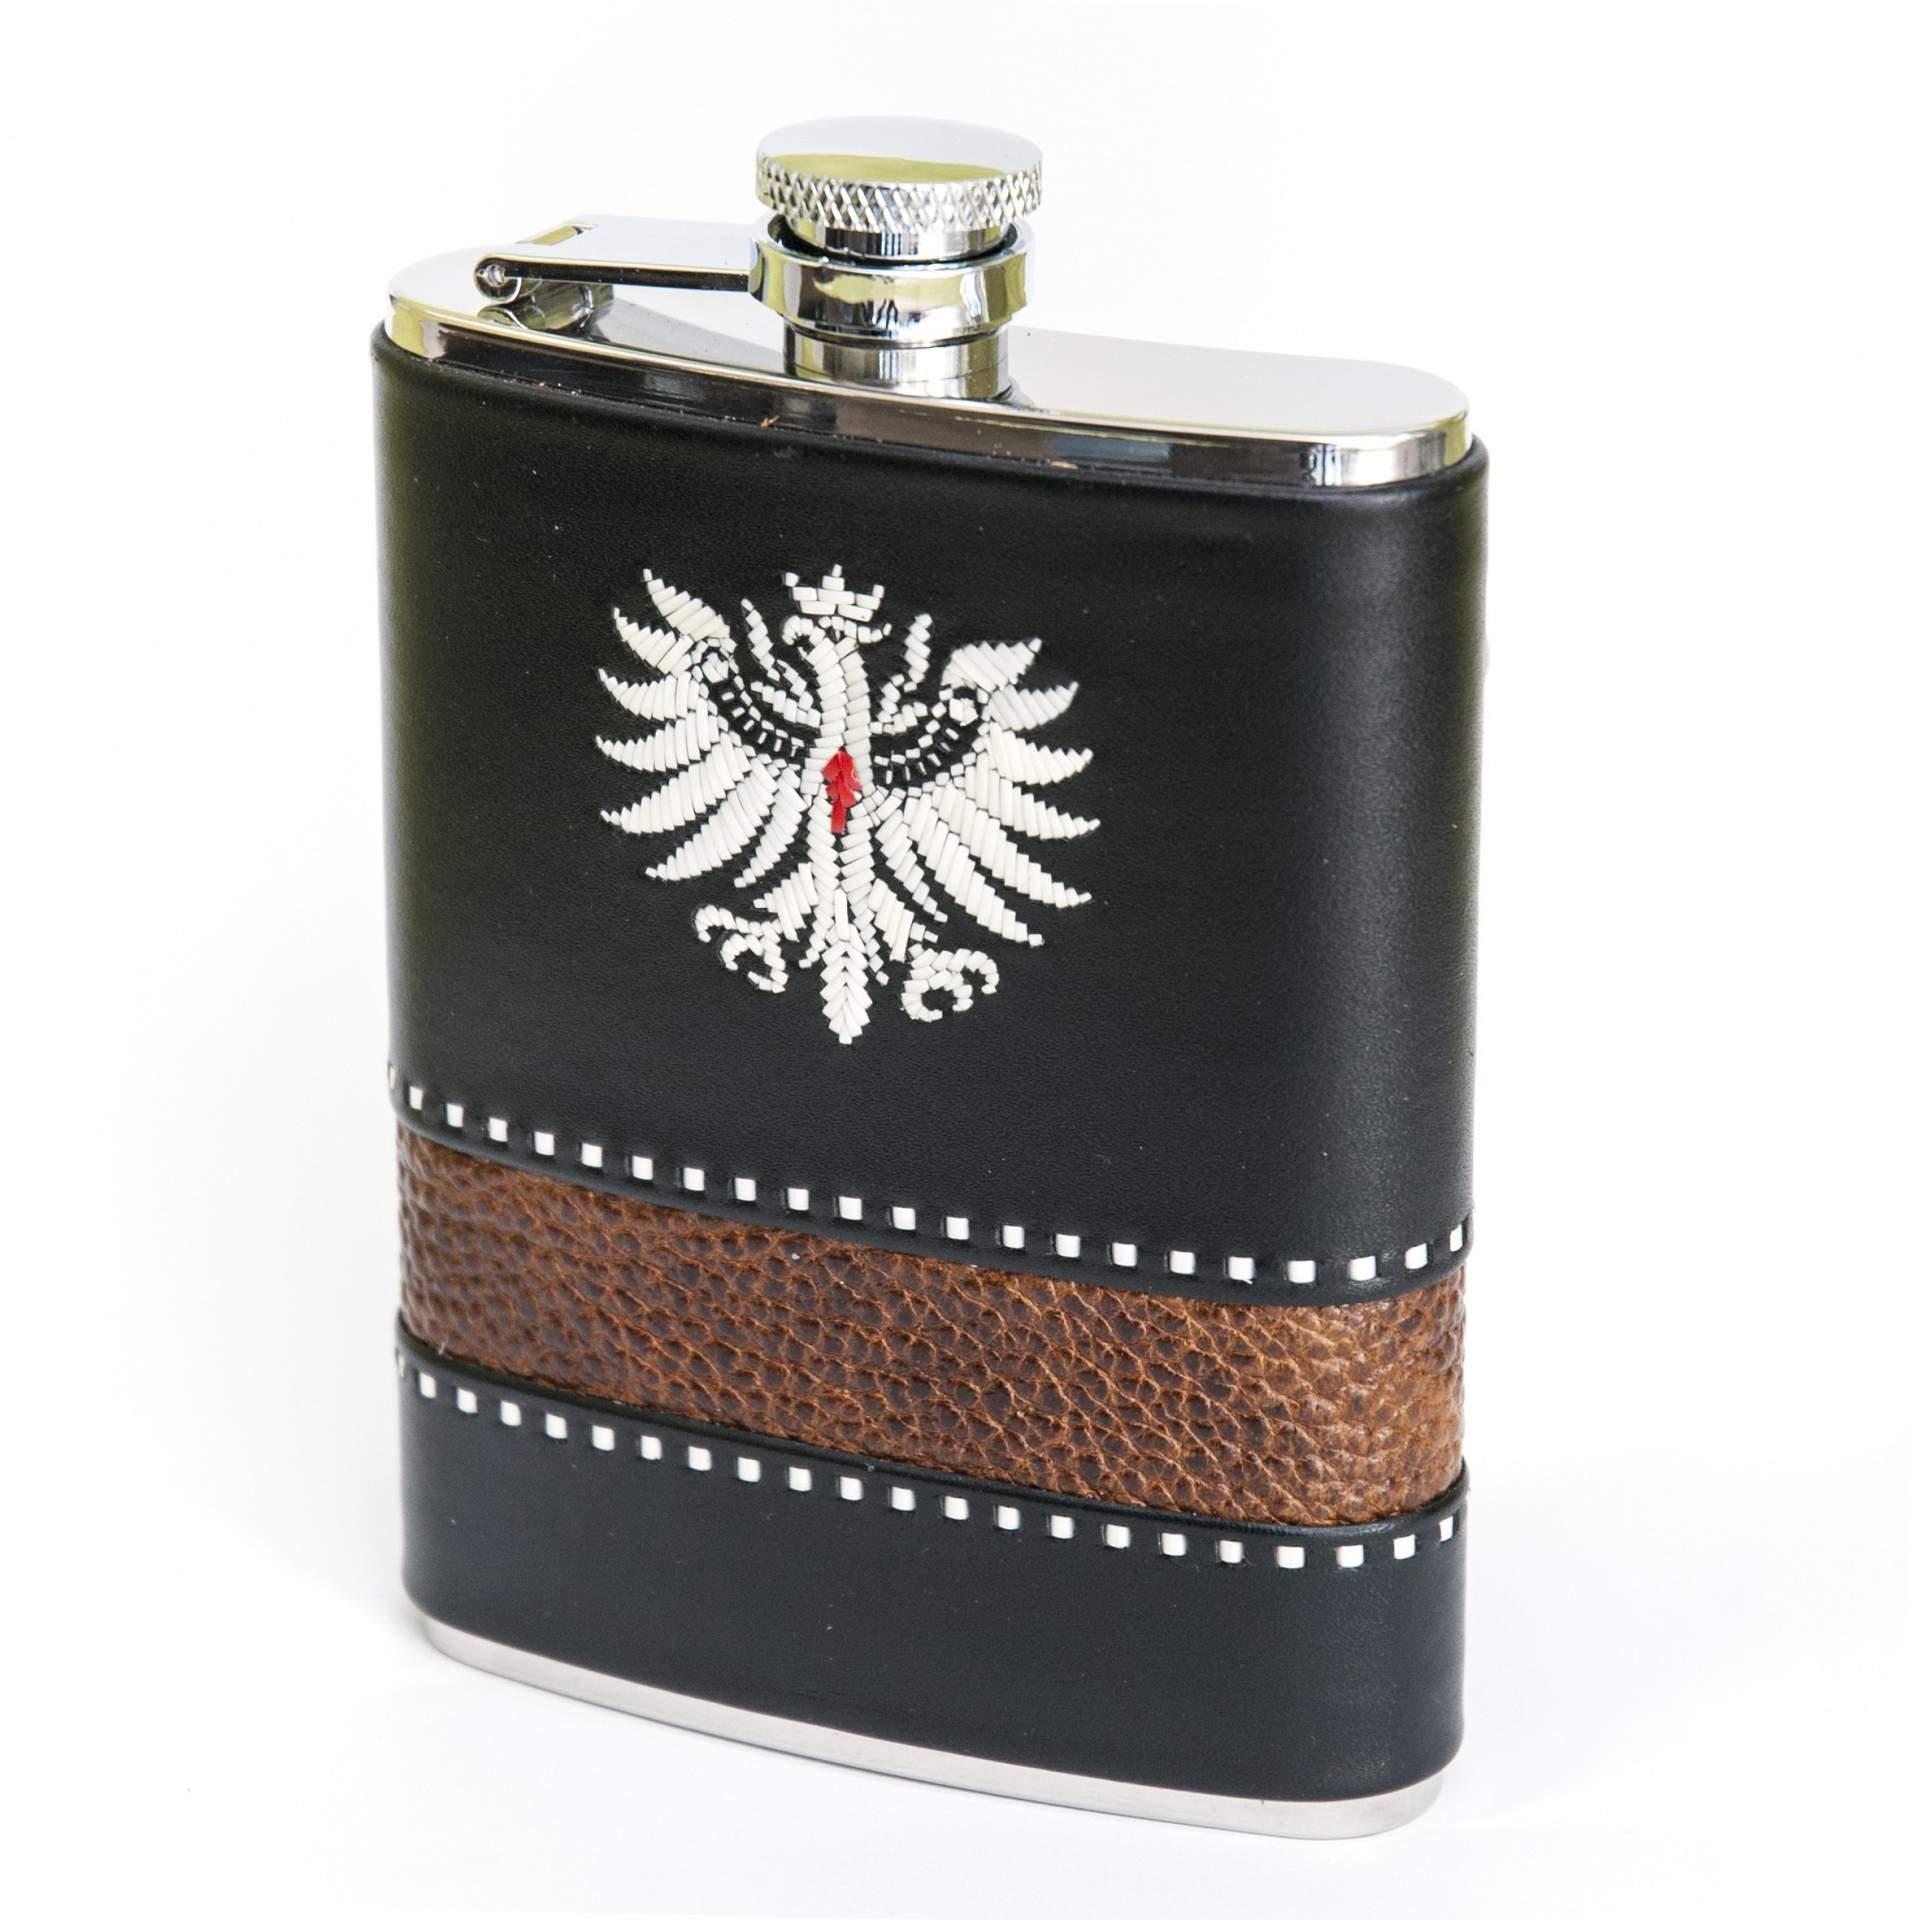 Flachmann mit Tiroler Adler